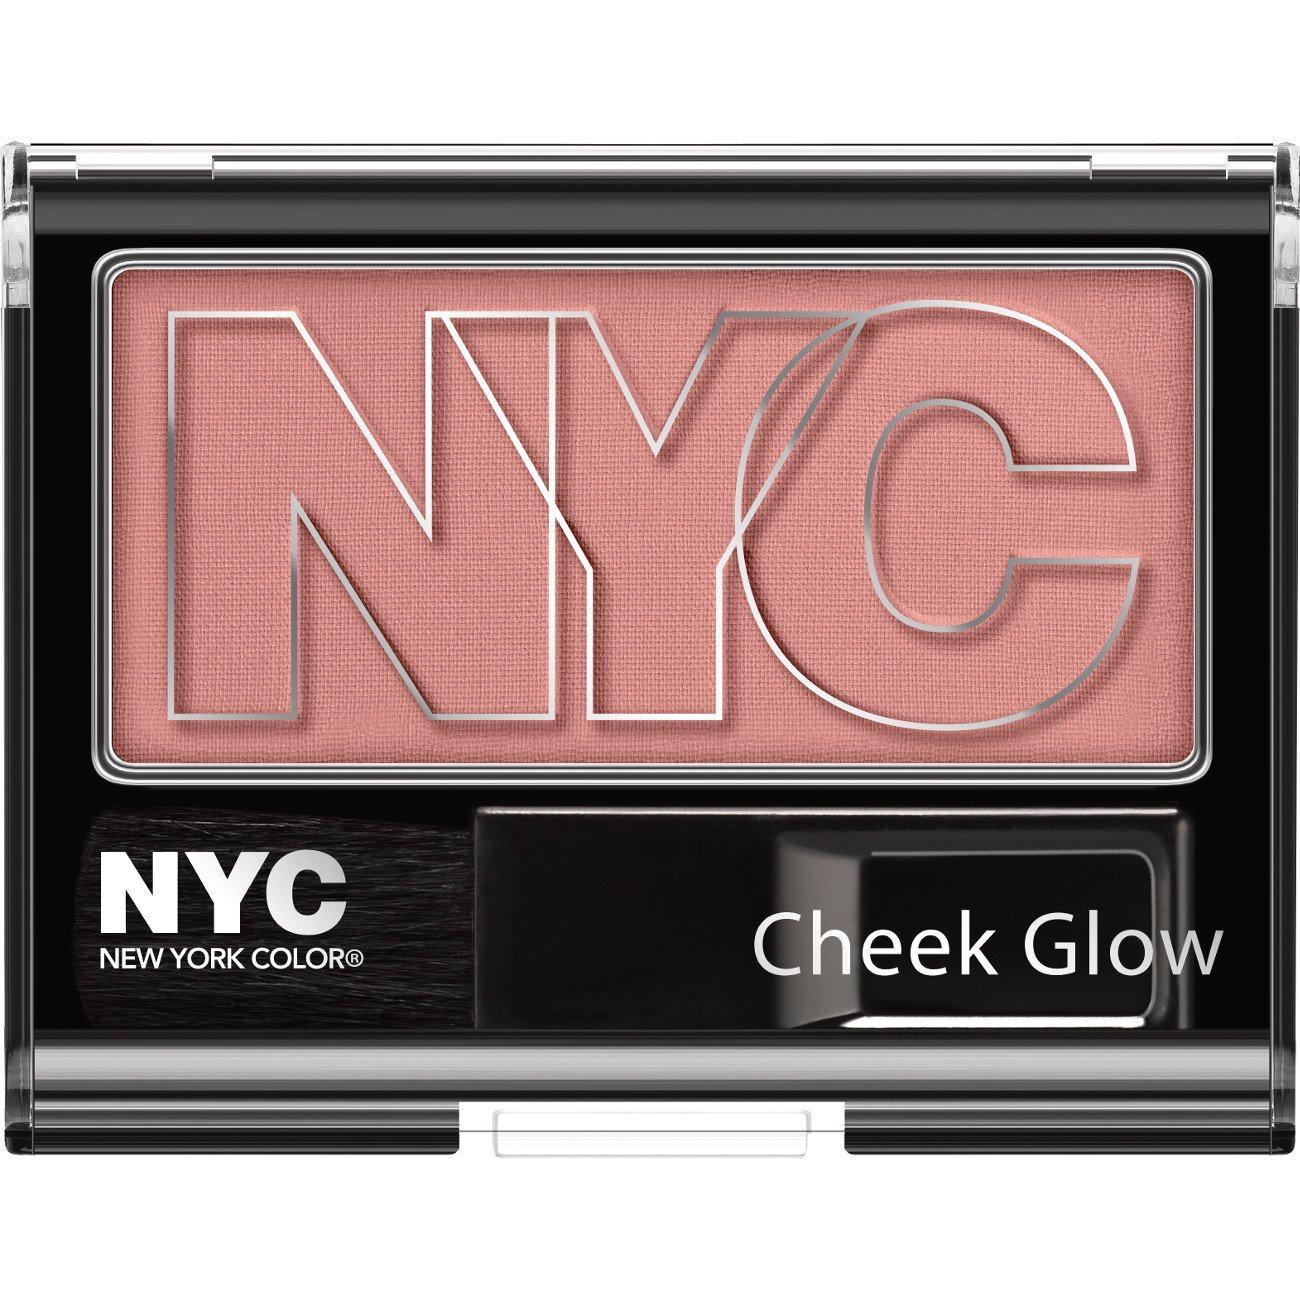 N.Y.C. New York Color Cheek Glow Blush, West Side Wine Coty 30068035652